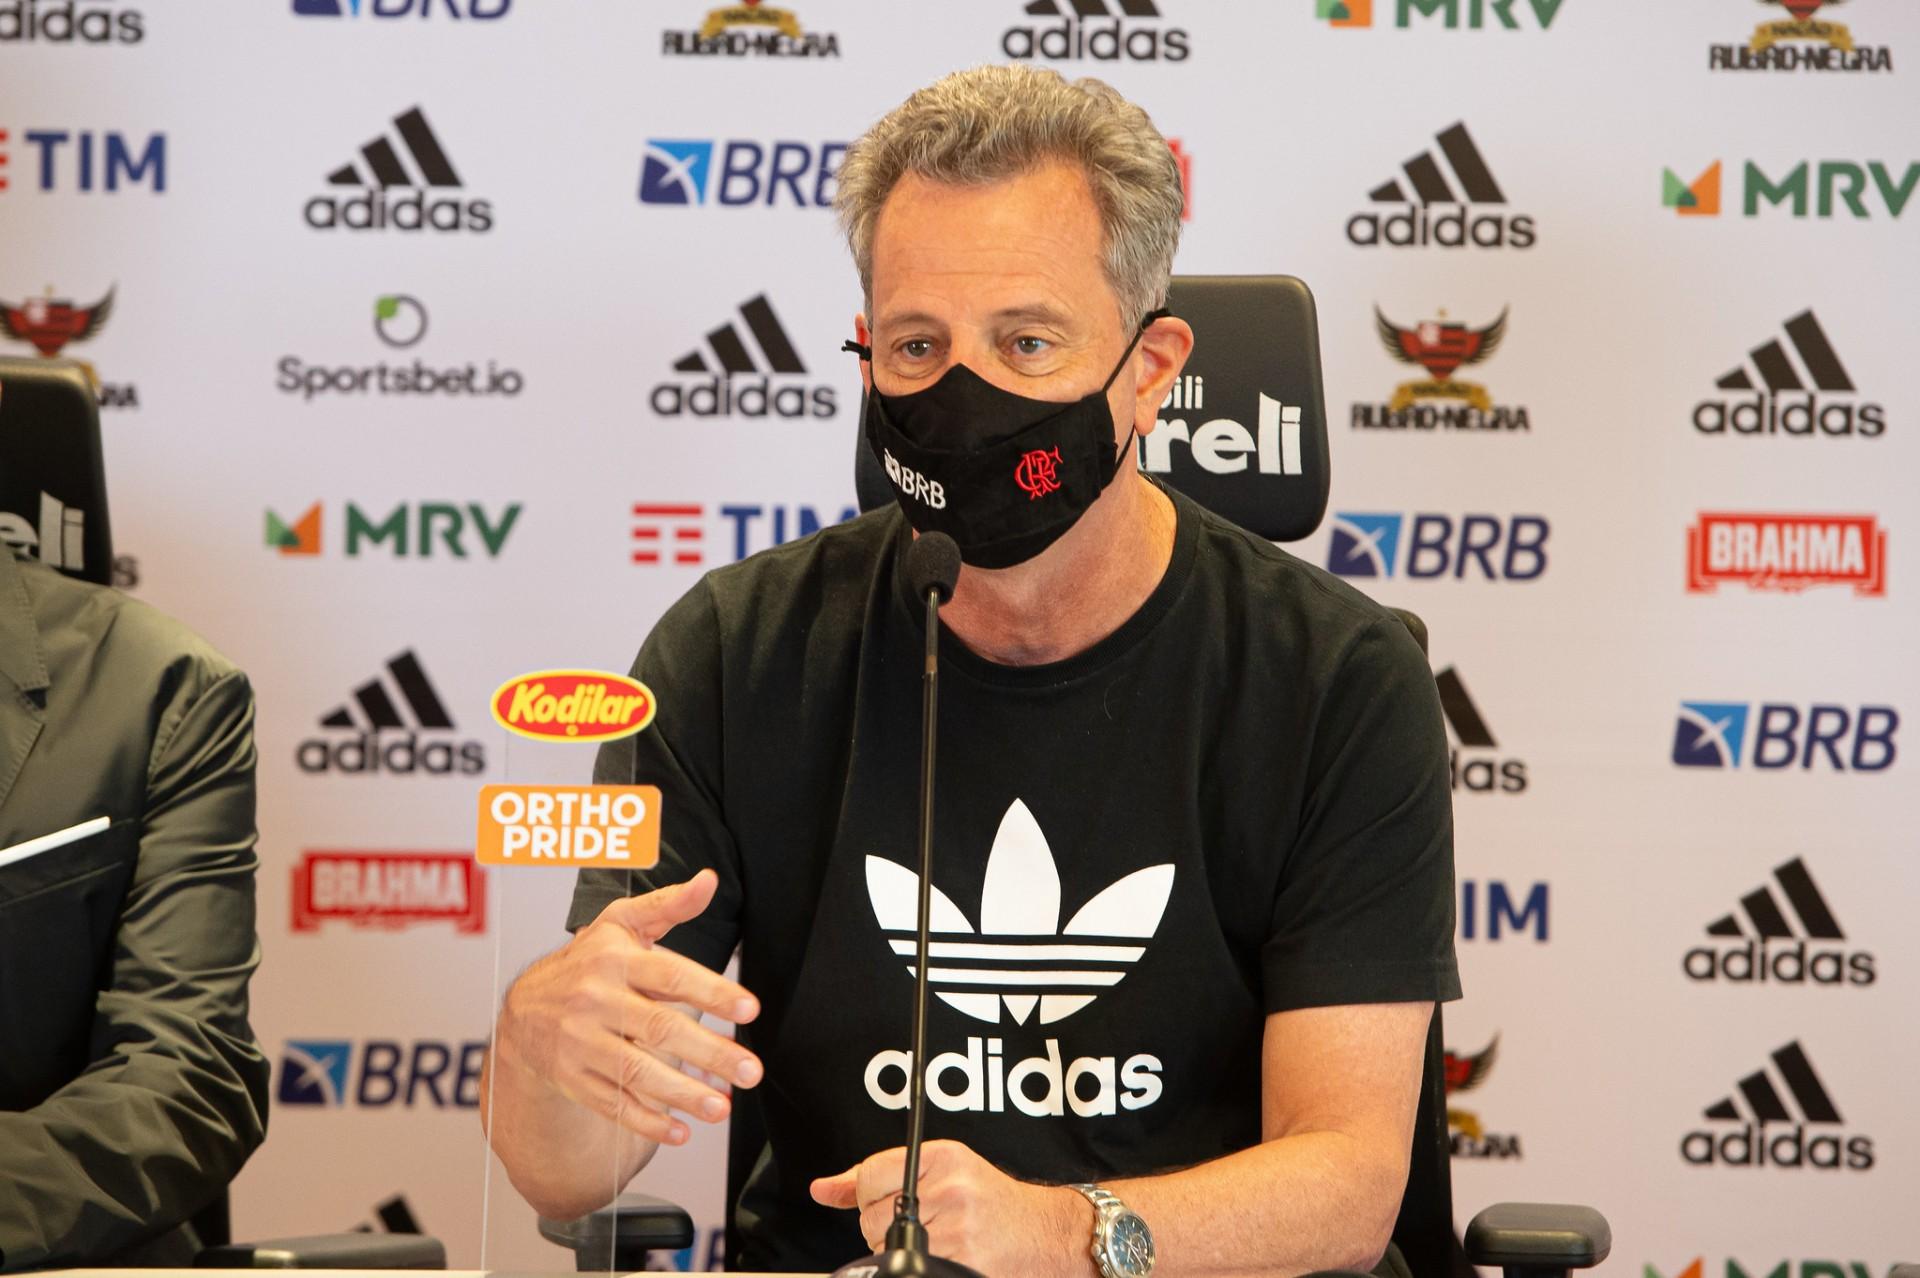 Presidente Rodolfo Landim, do Flamengo, em entrevista coletiva de máscara